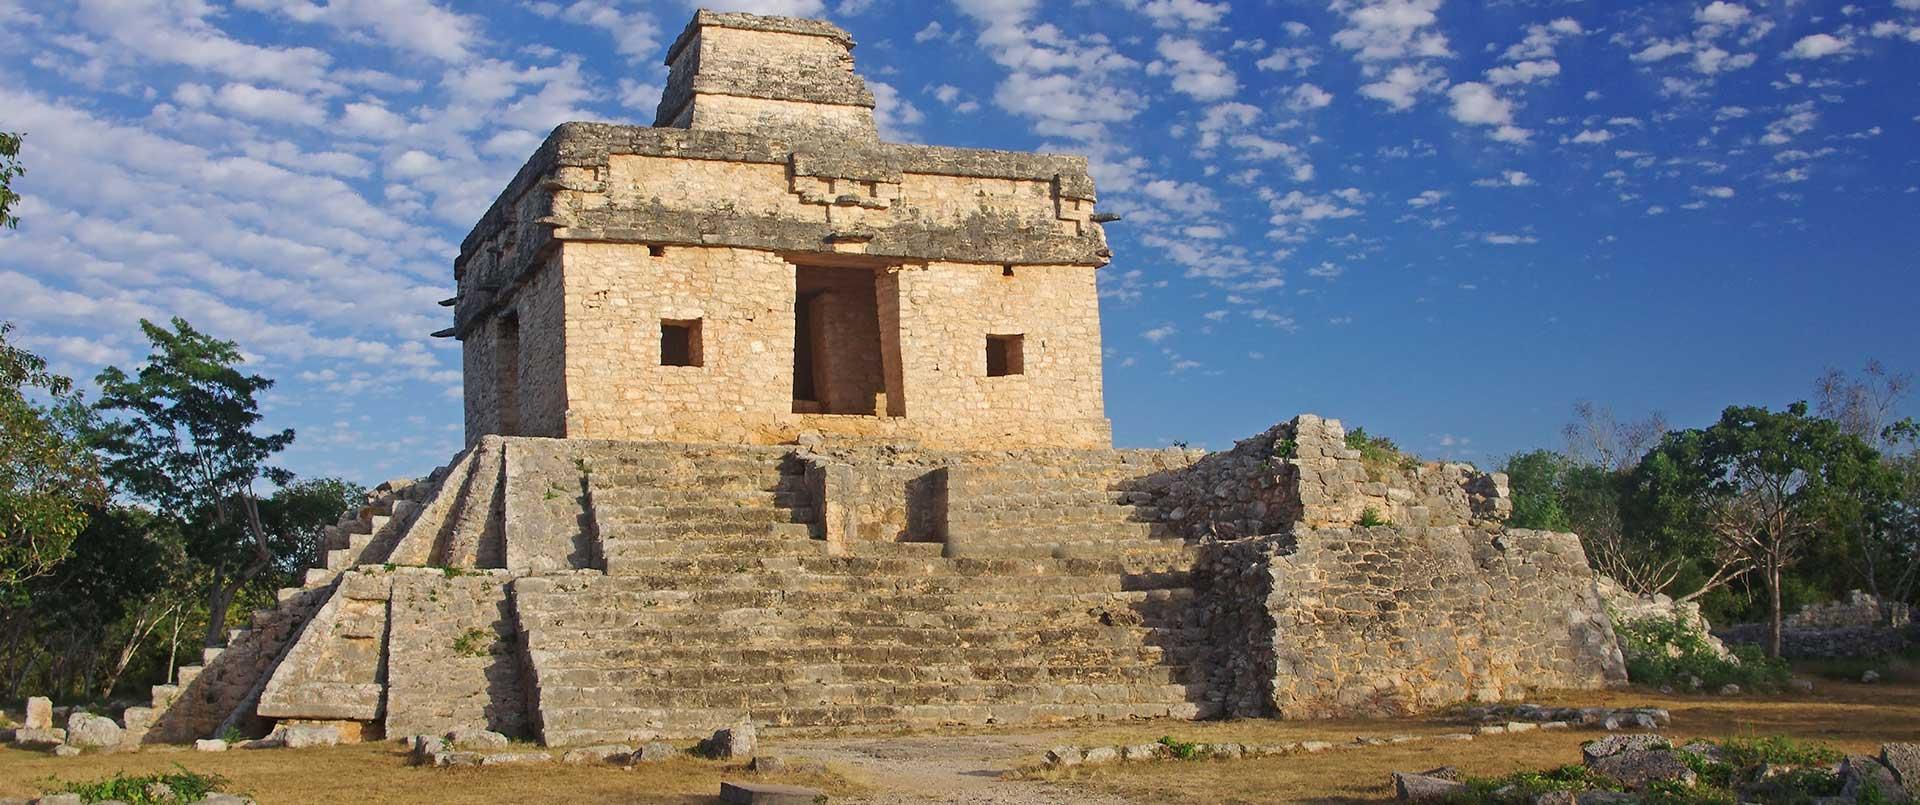 Classic Civilizations of Mexico